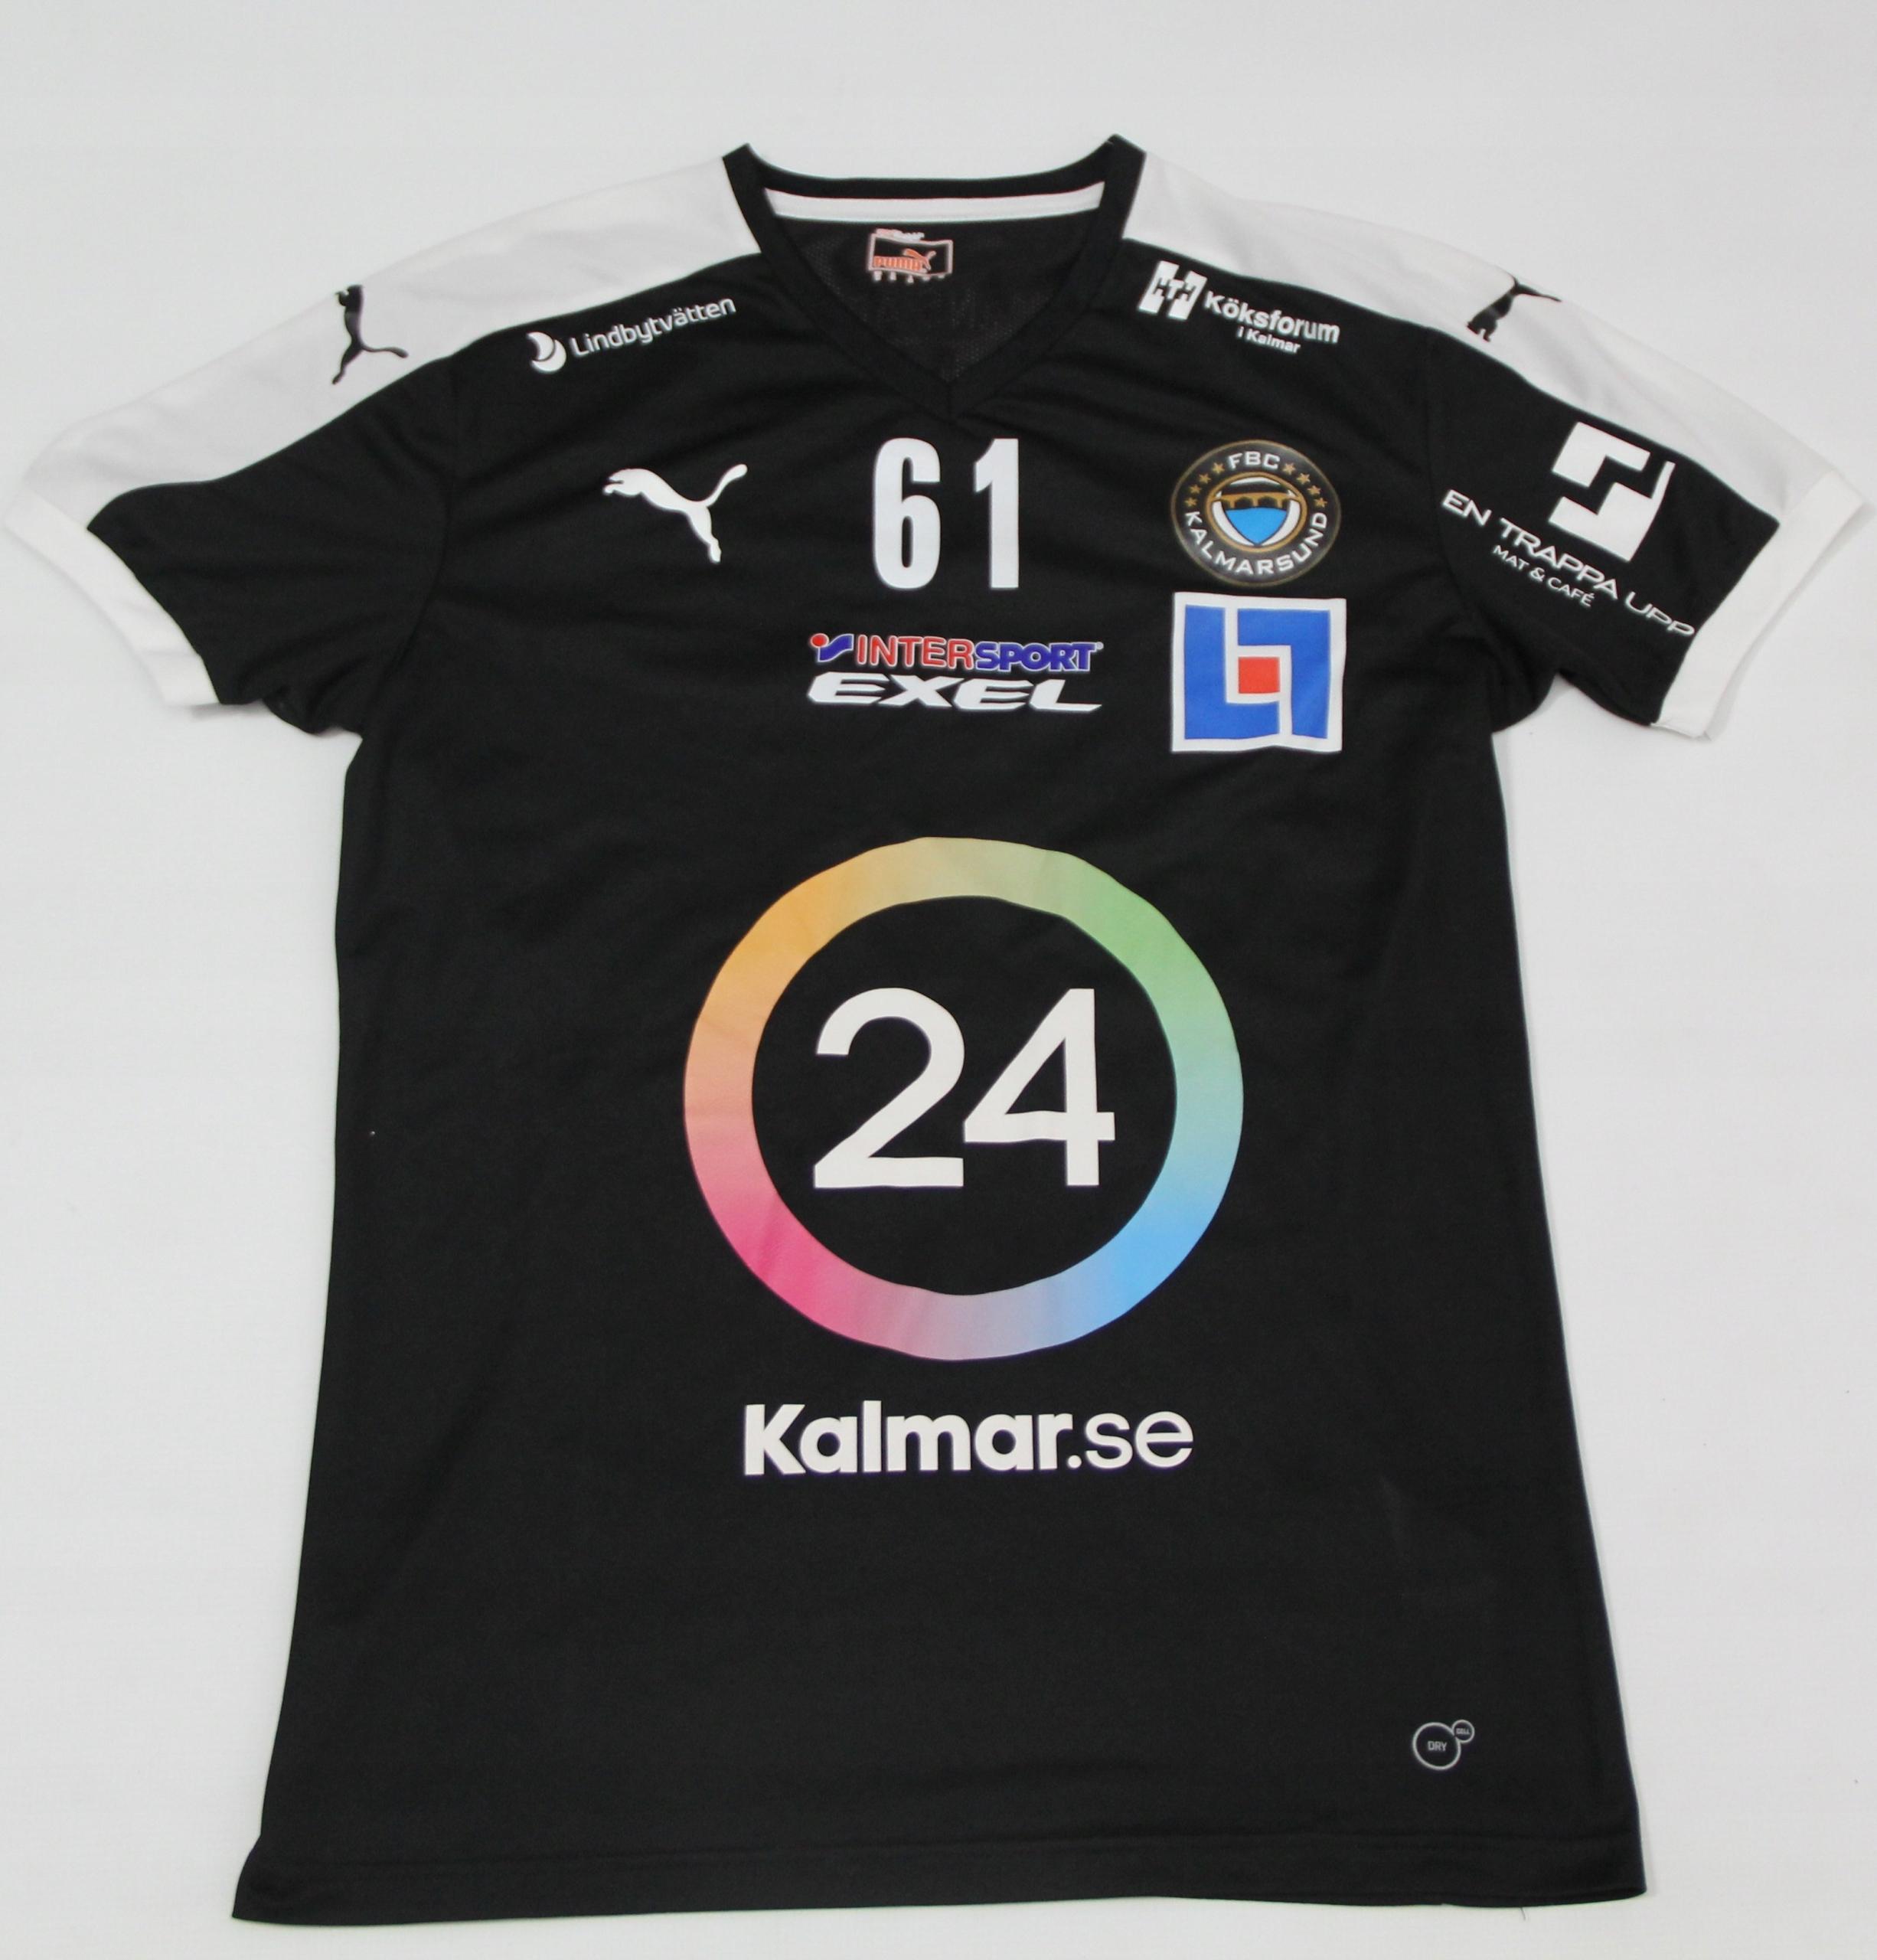 Koszulka Puma FBC KALMARSUND Nr-61